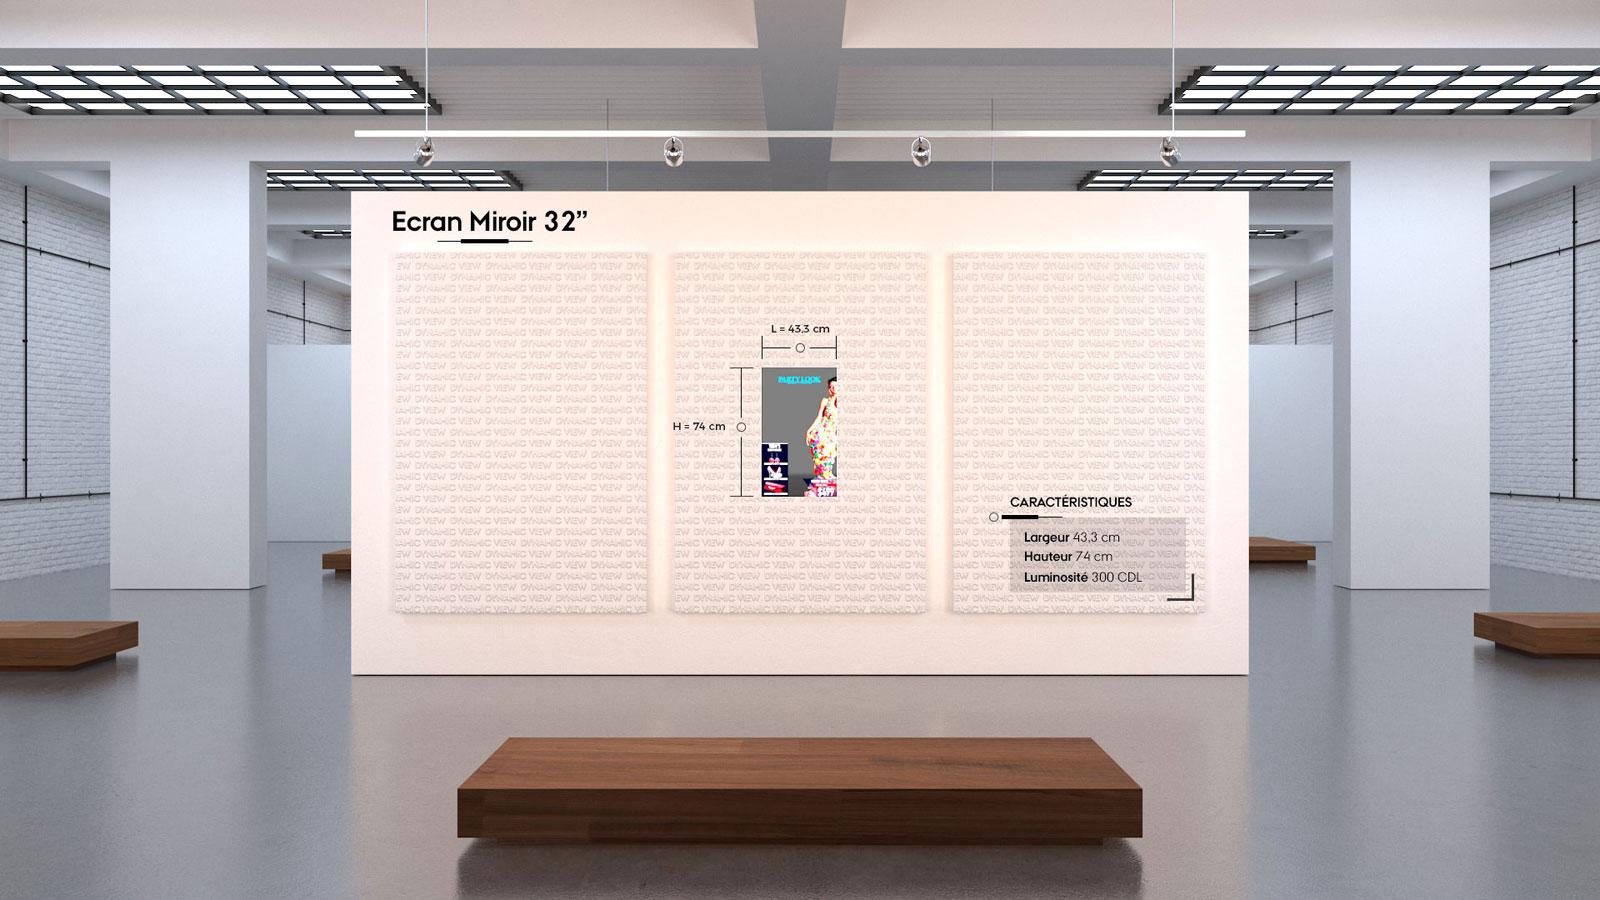 17 Ecran Miroir 32''